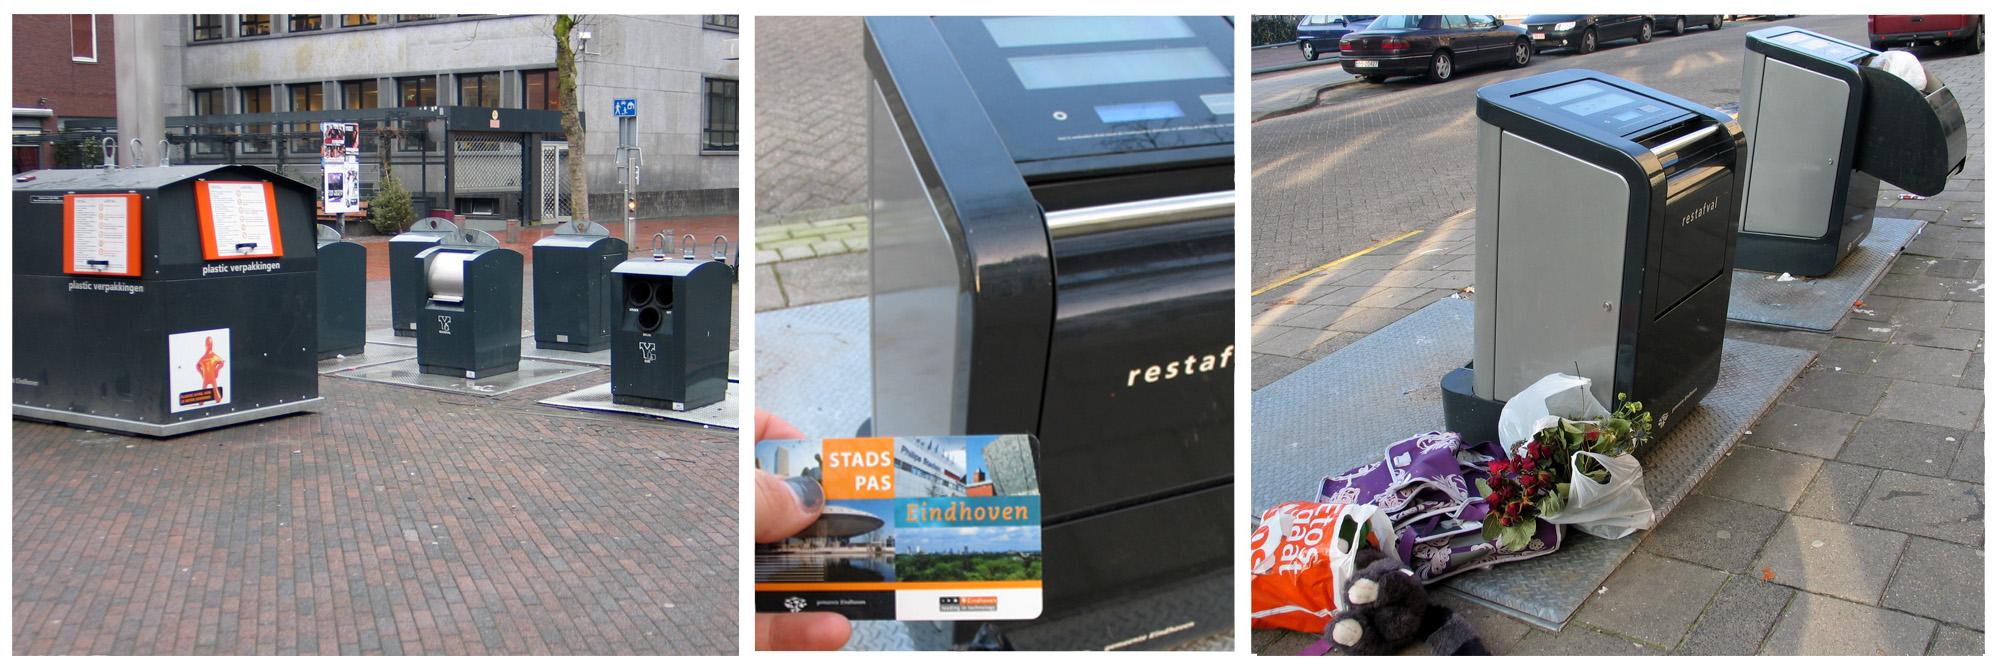 avfal en vuilnisbak in Eindhoven